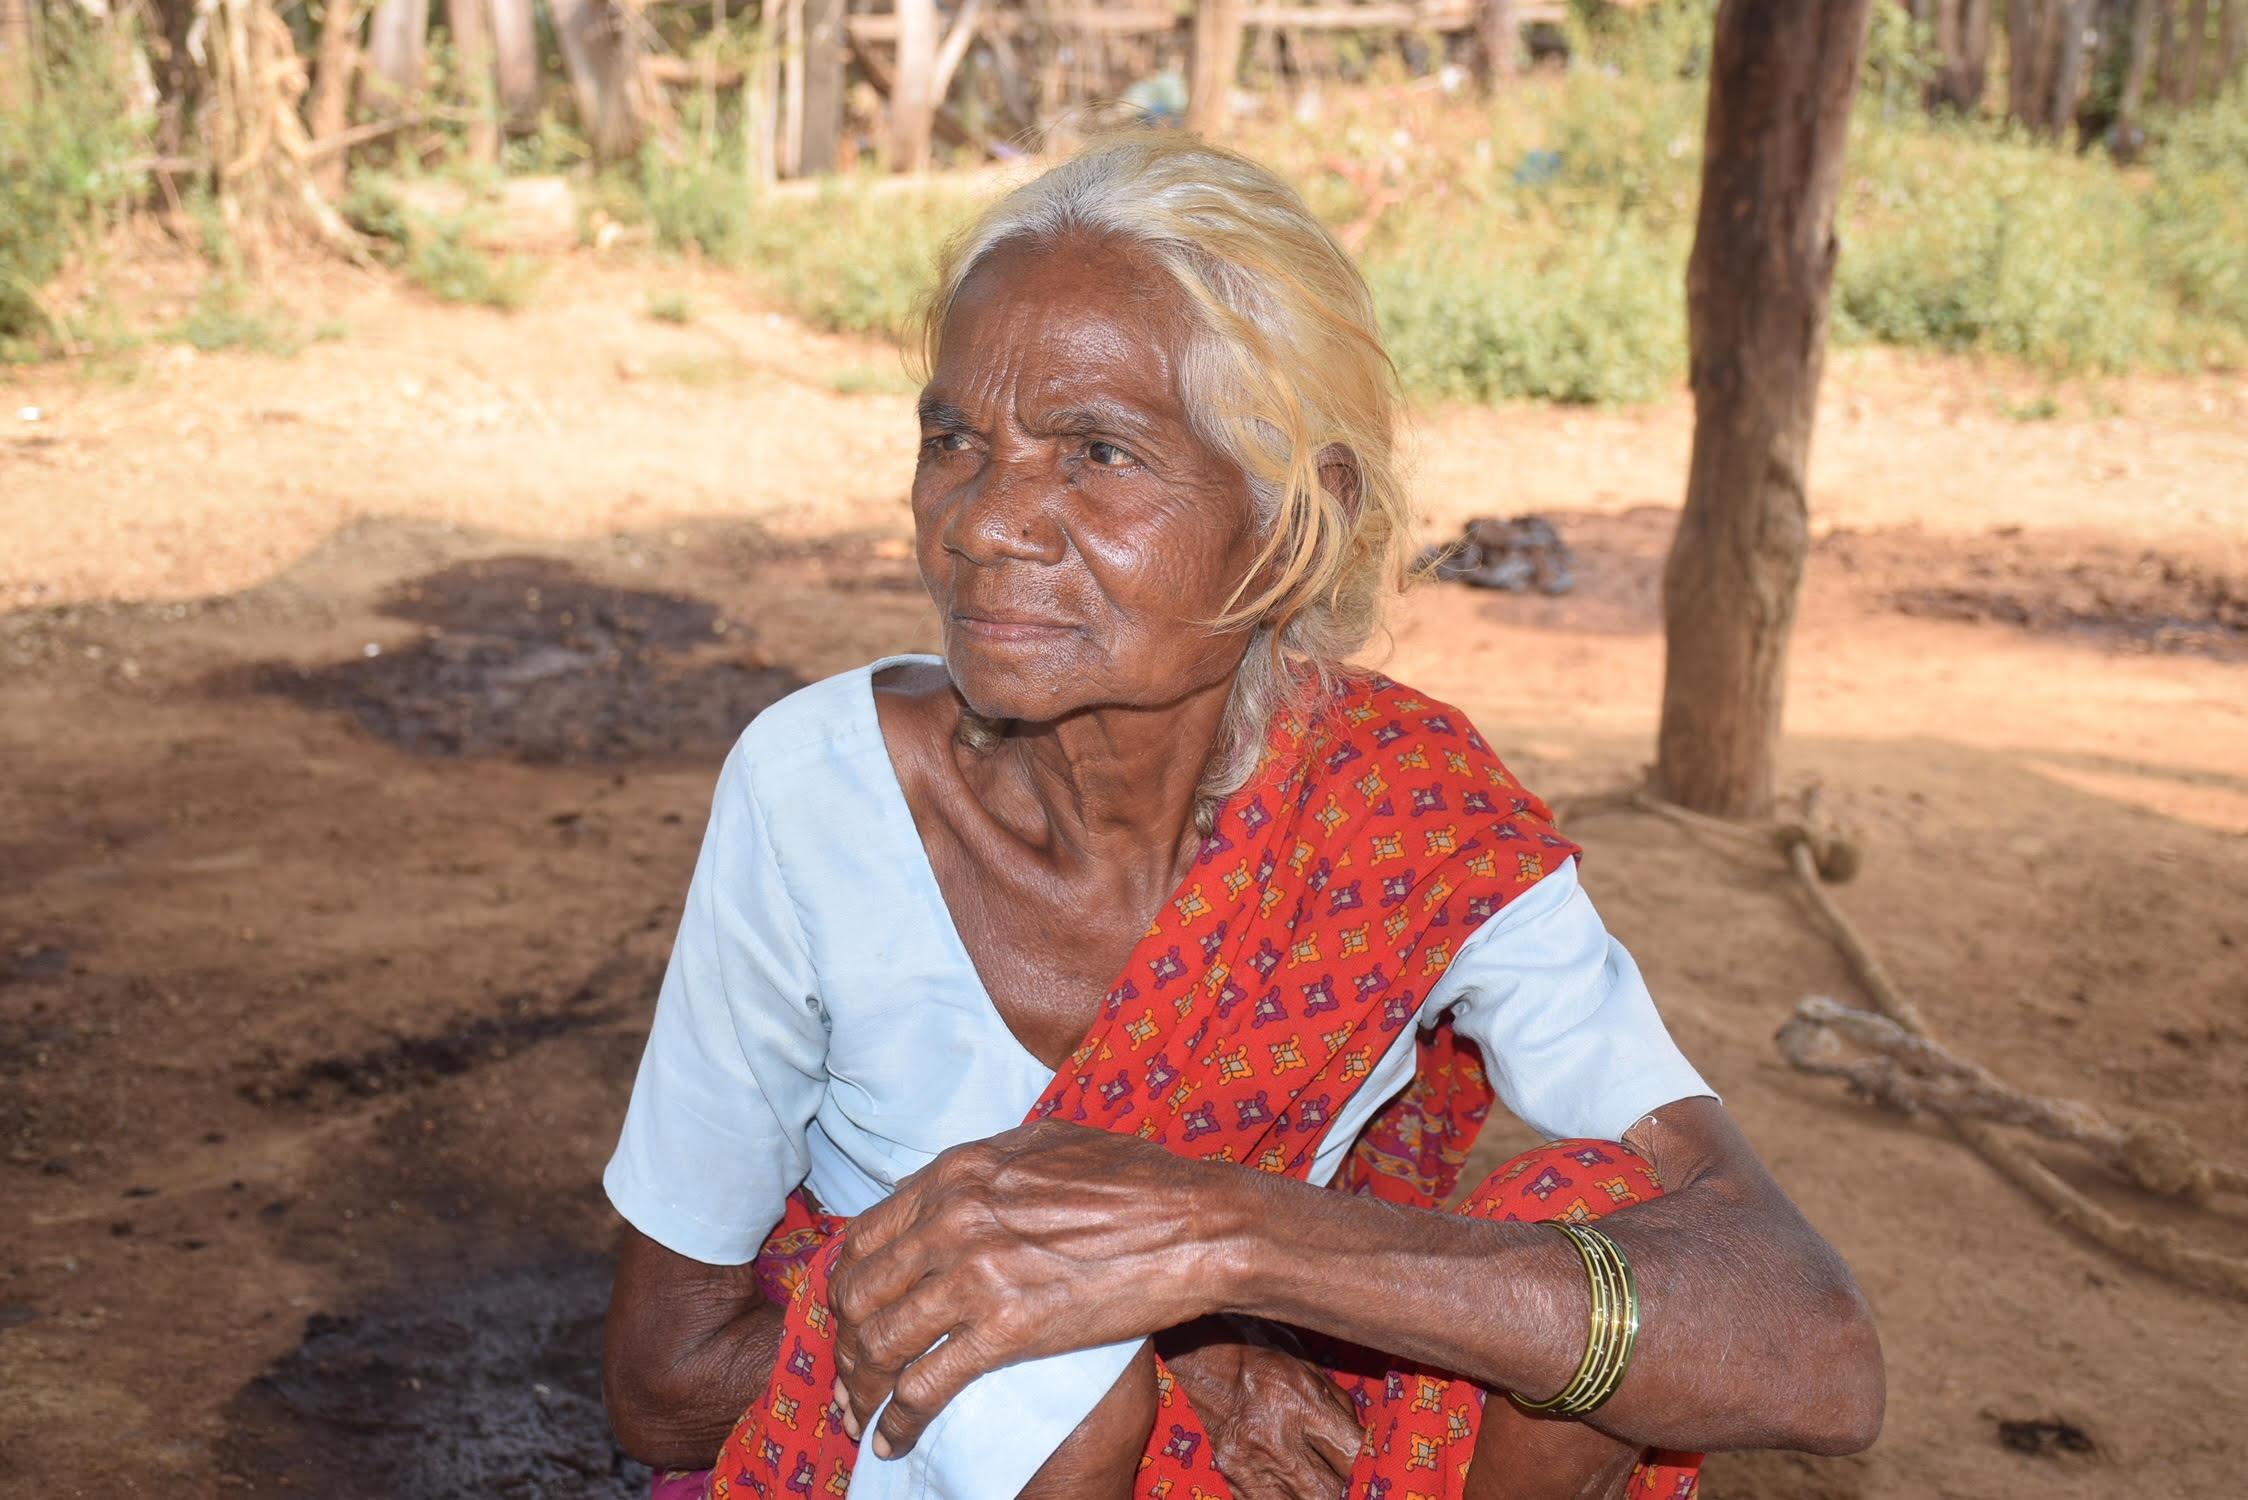 Battu Adinarayana's 70-year-old mother Lakshmi at their house in Gattumala village in Bhadradri Kothagudem district in eastern Telangana. Credit: Sukanya Shantha